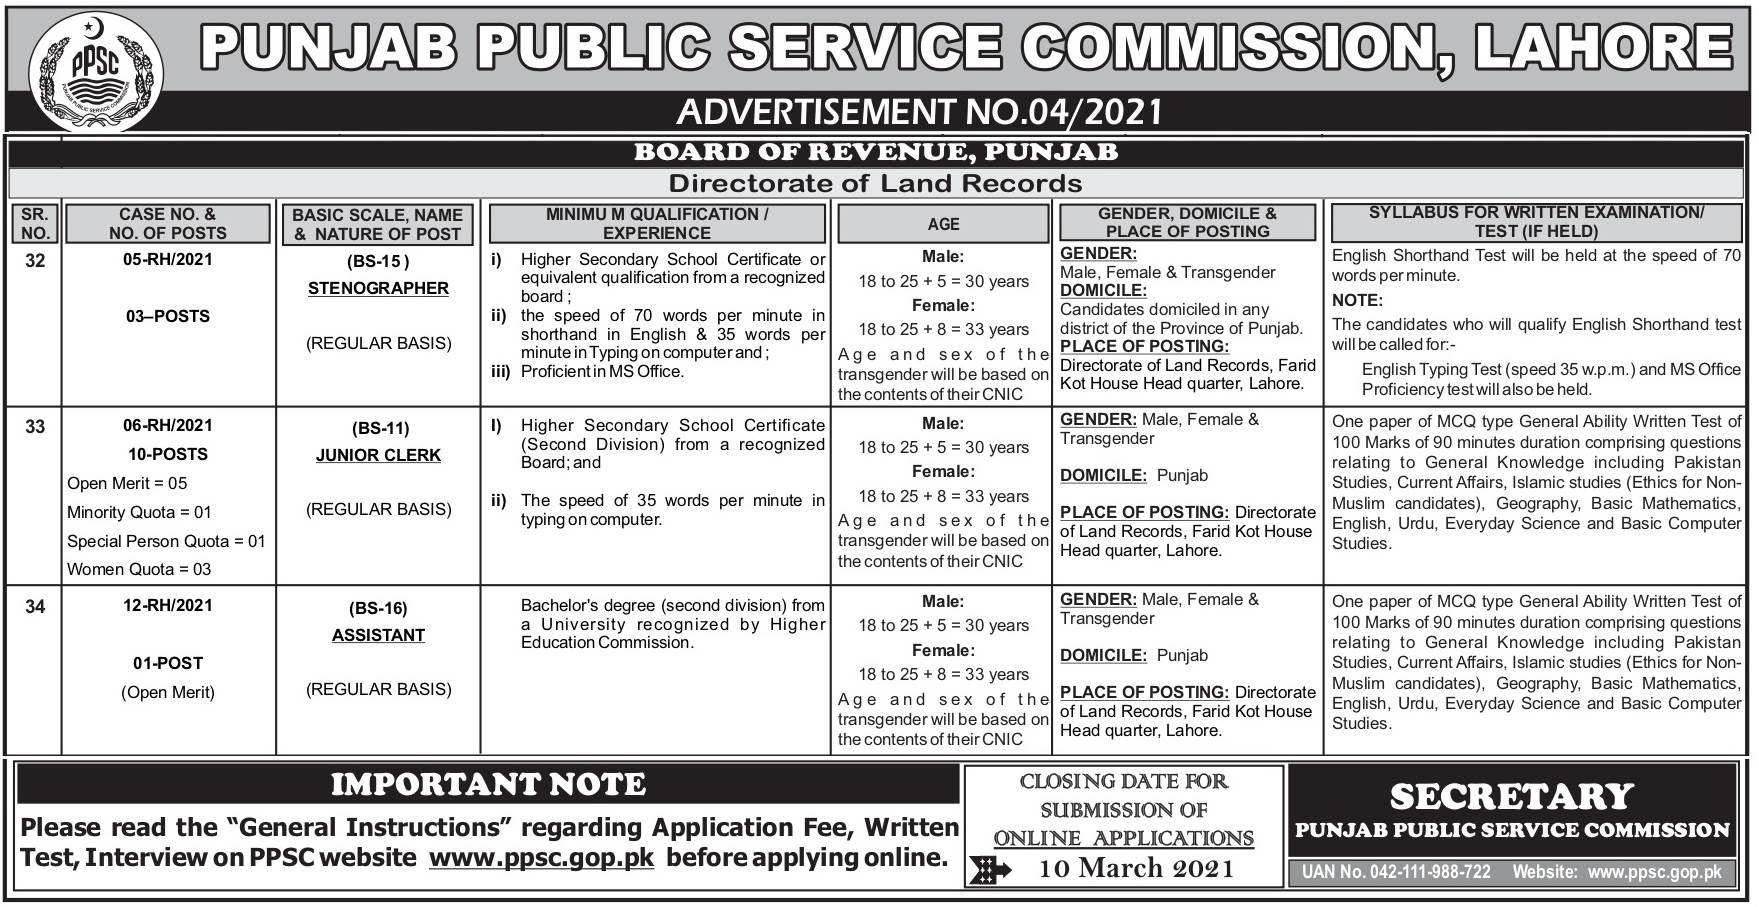 Board of Revenue Panjab